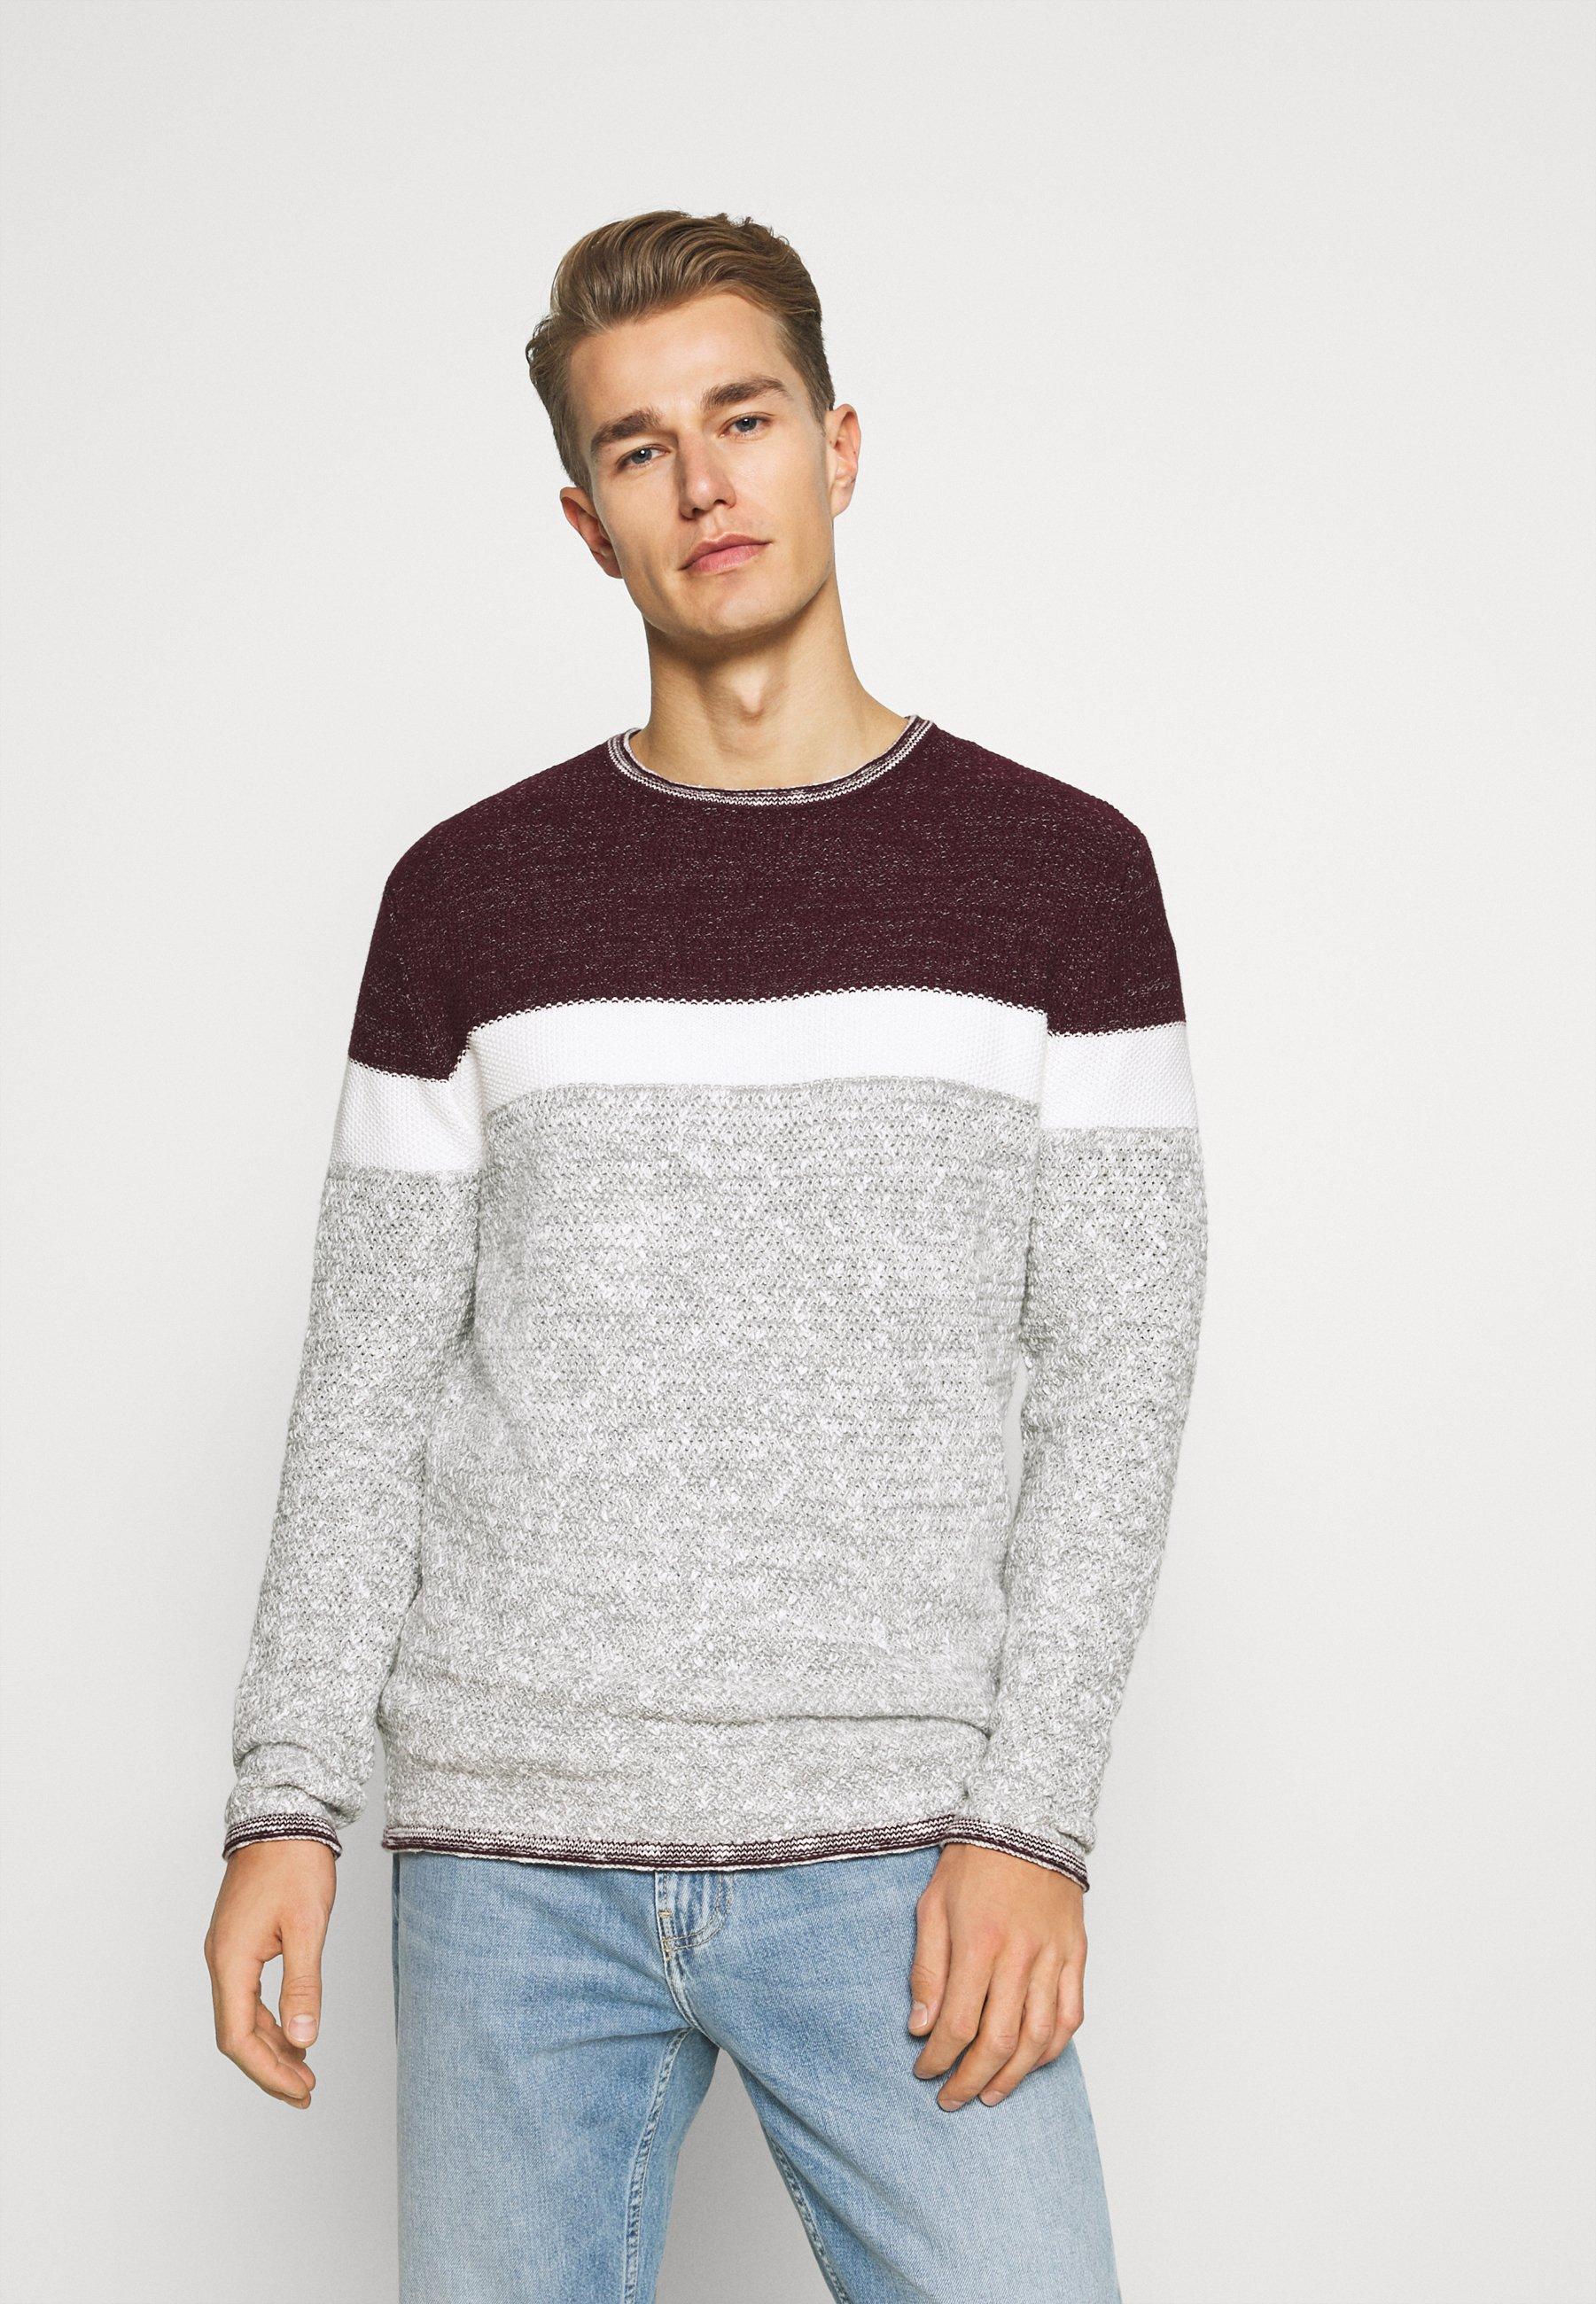 Stickade tröjor | Herr | Köp stickade tröjor online på